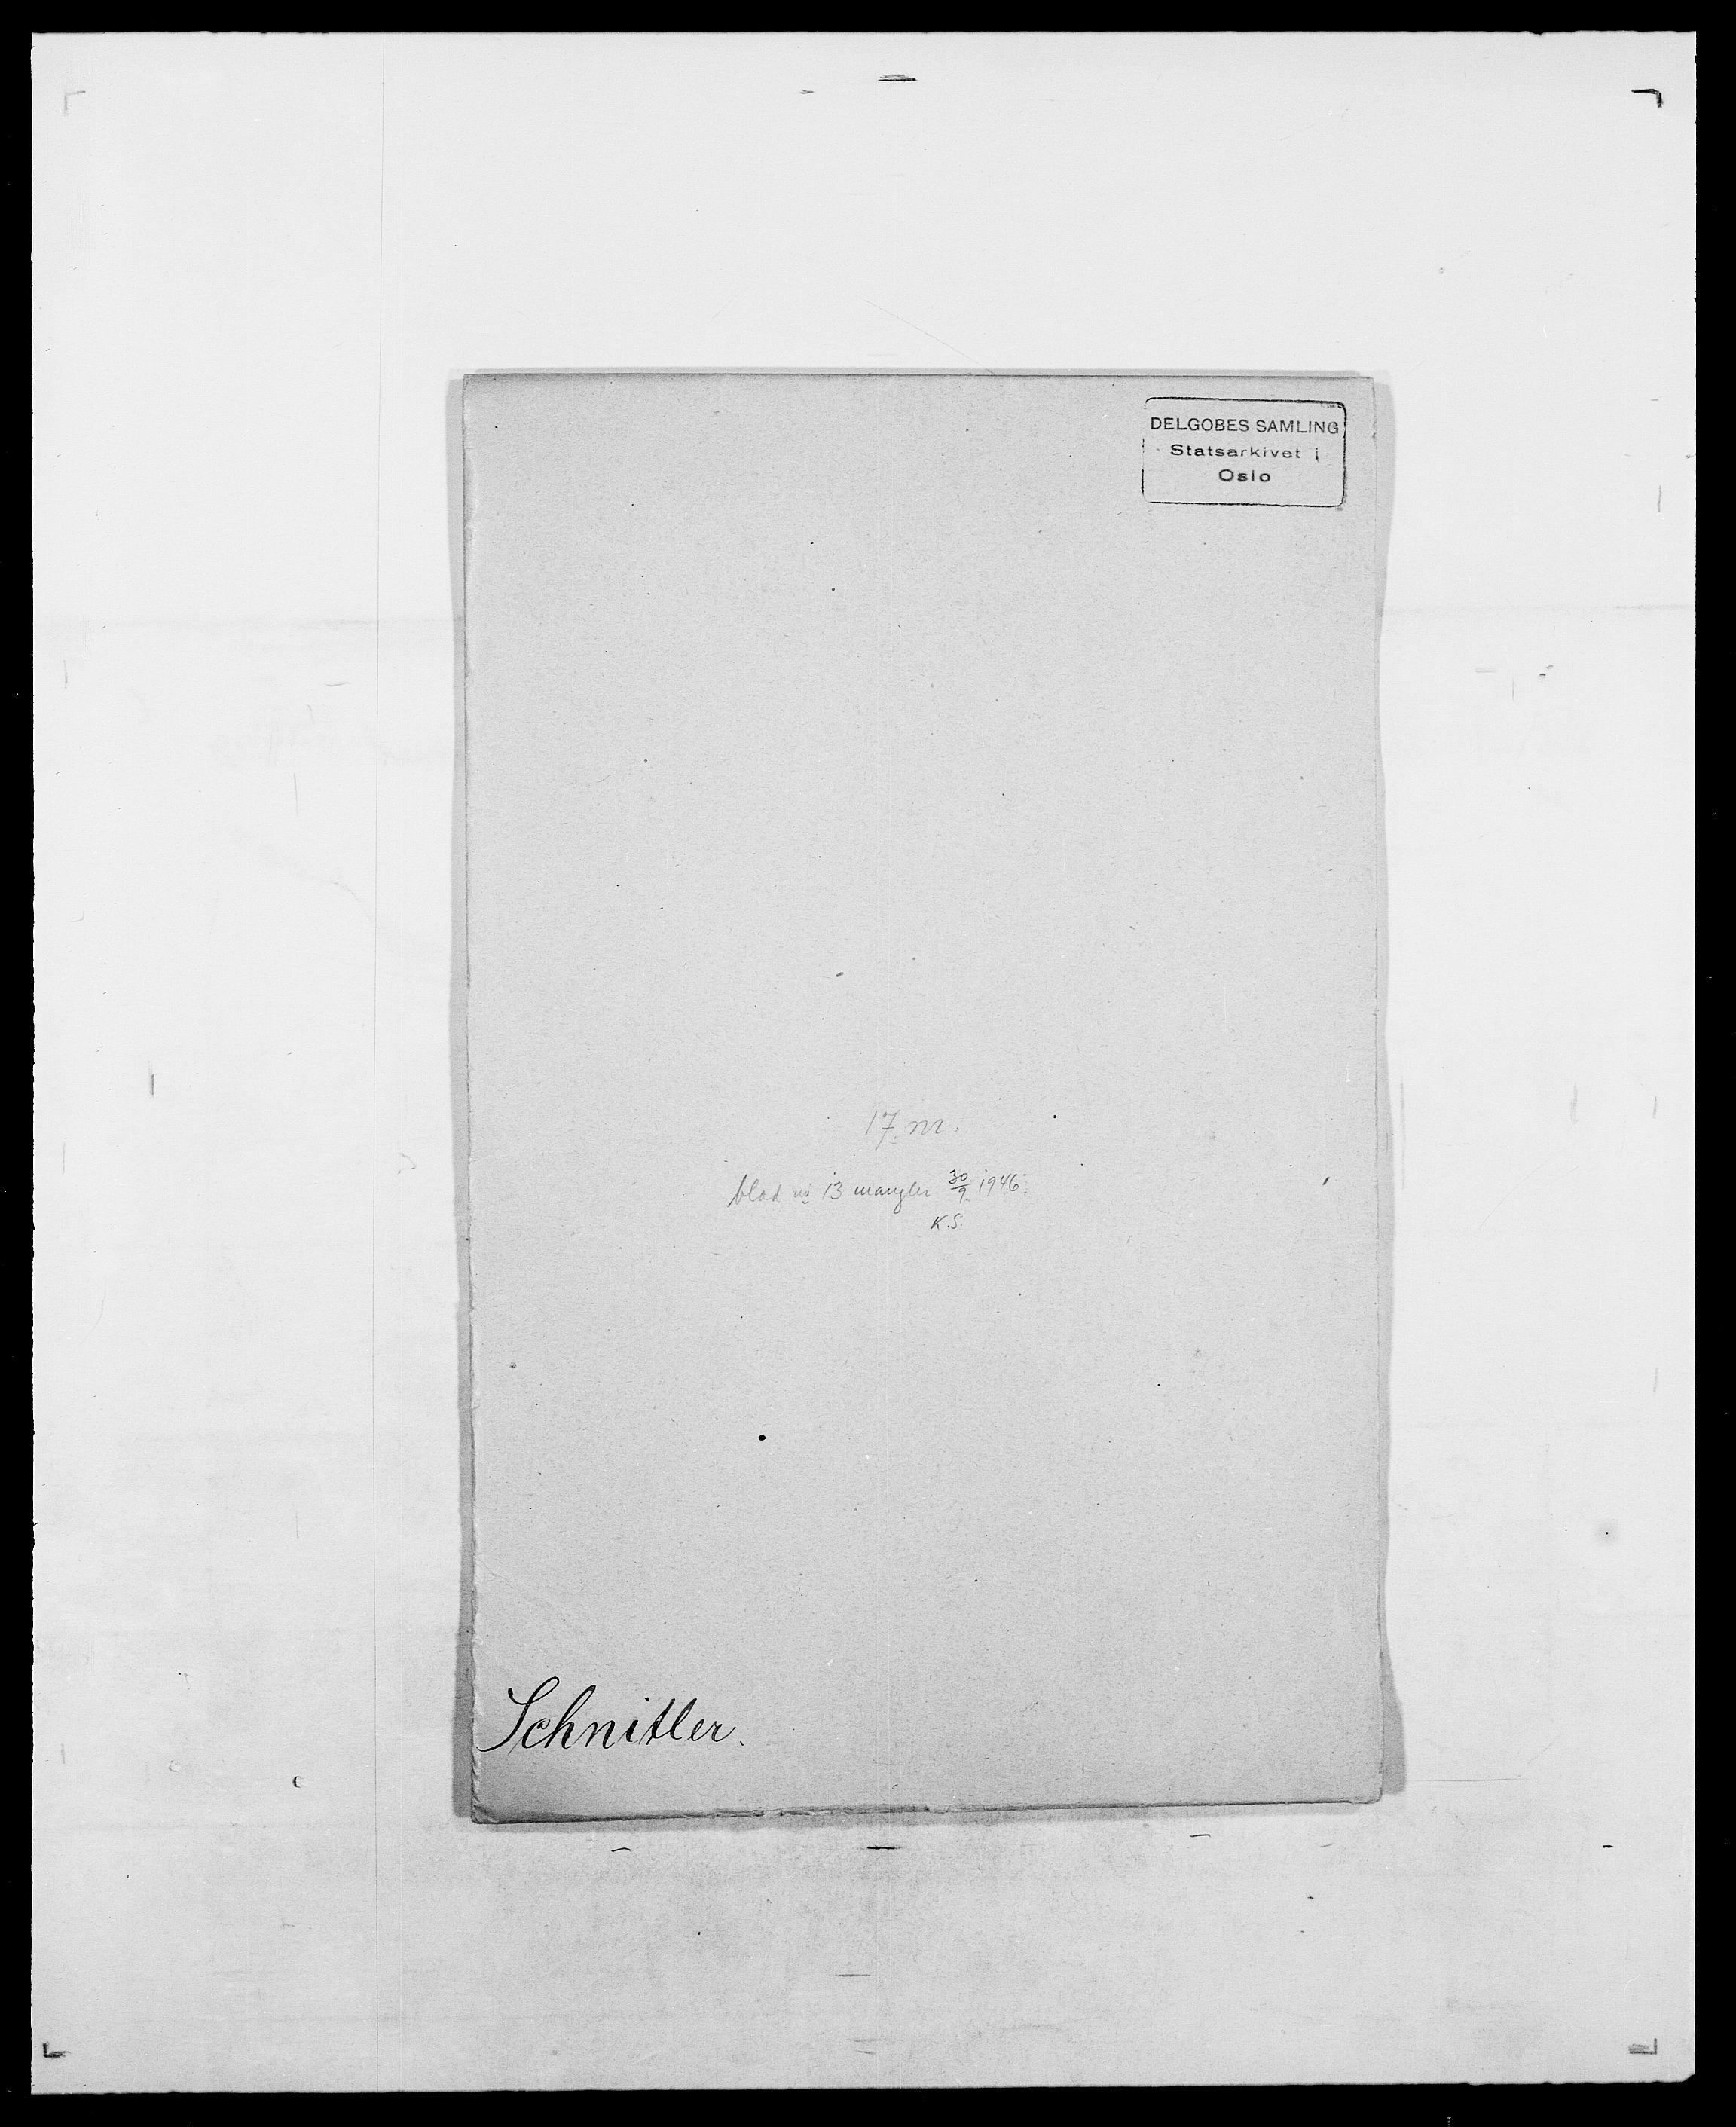 SAO, Delgobe, Charles Antoine - samling, D/Da/L0035: Schnabel - sjetman, s. 43